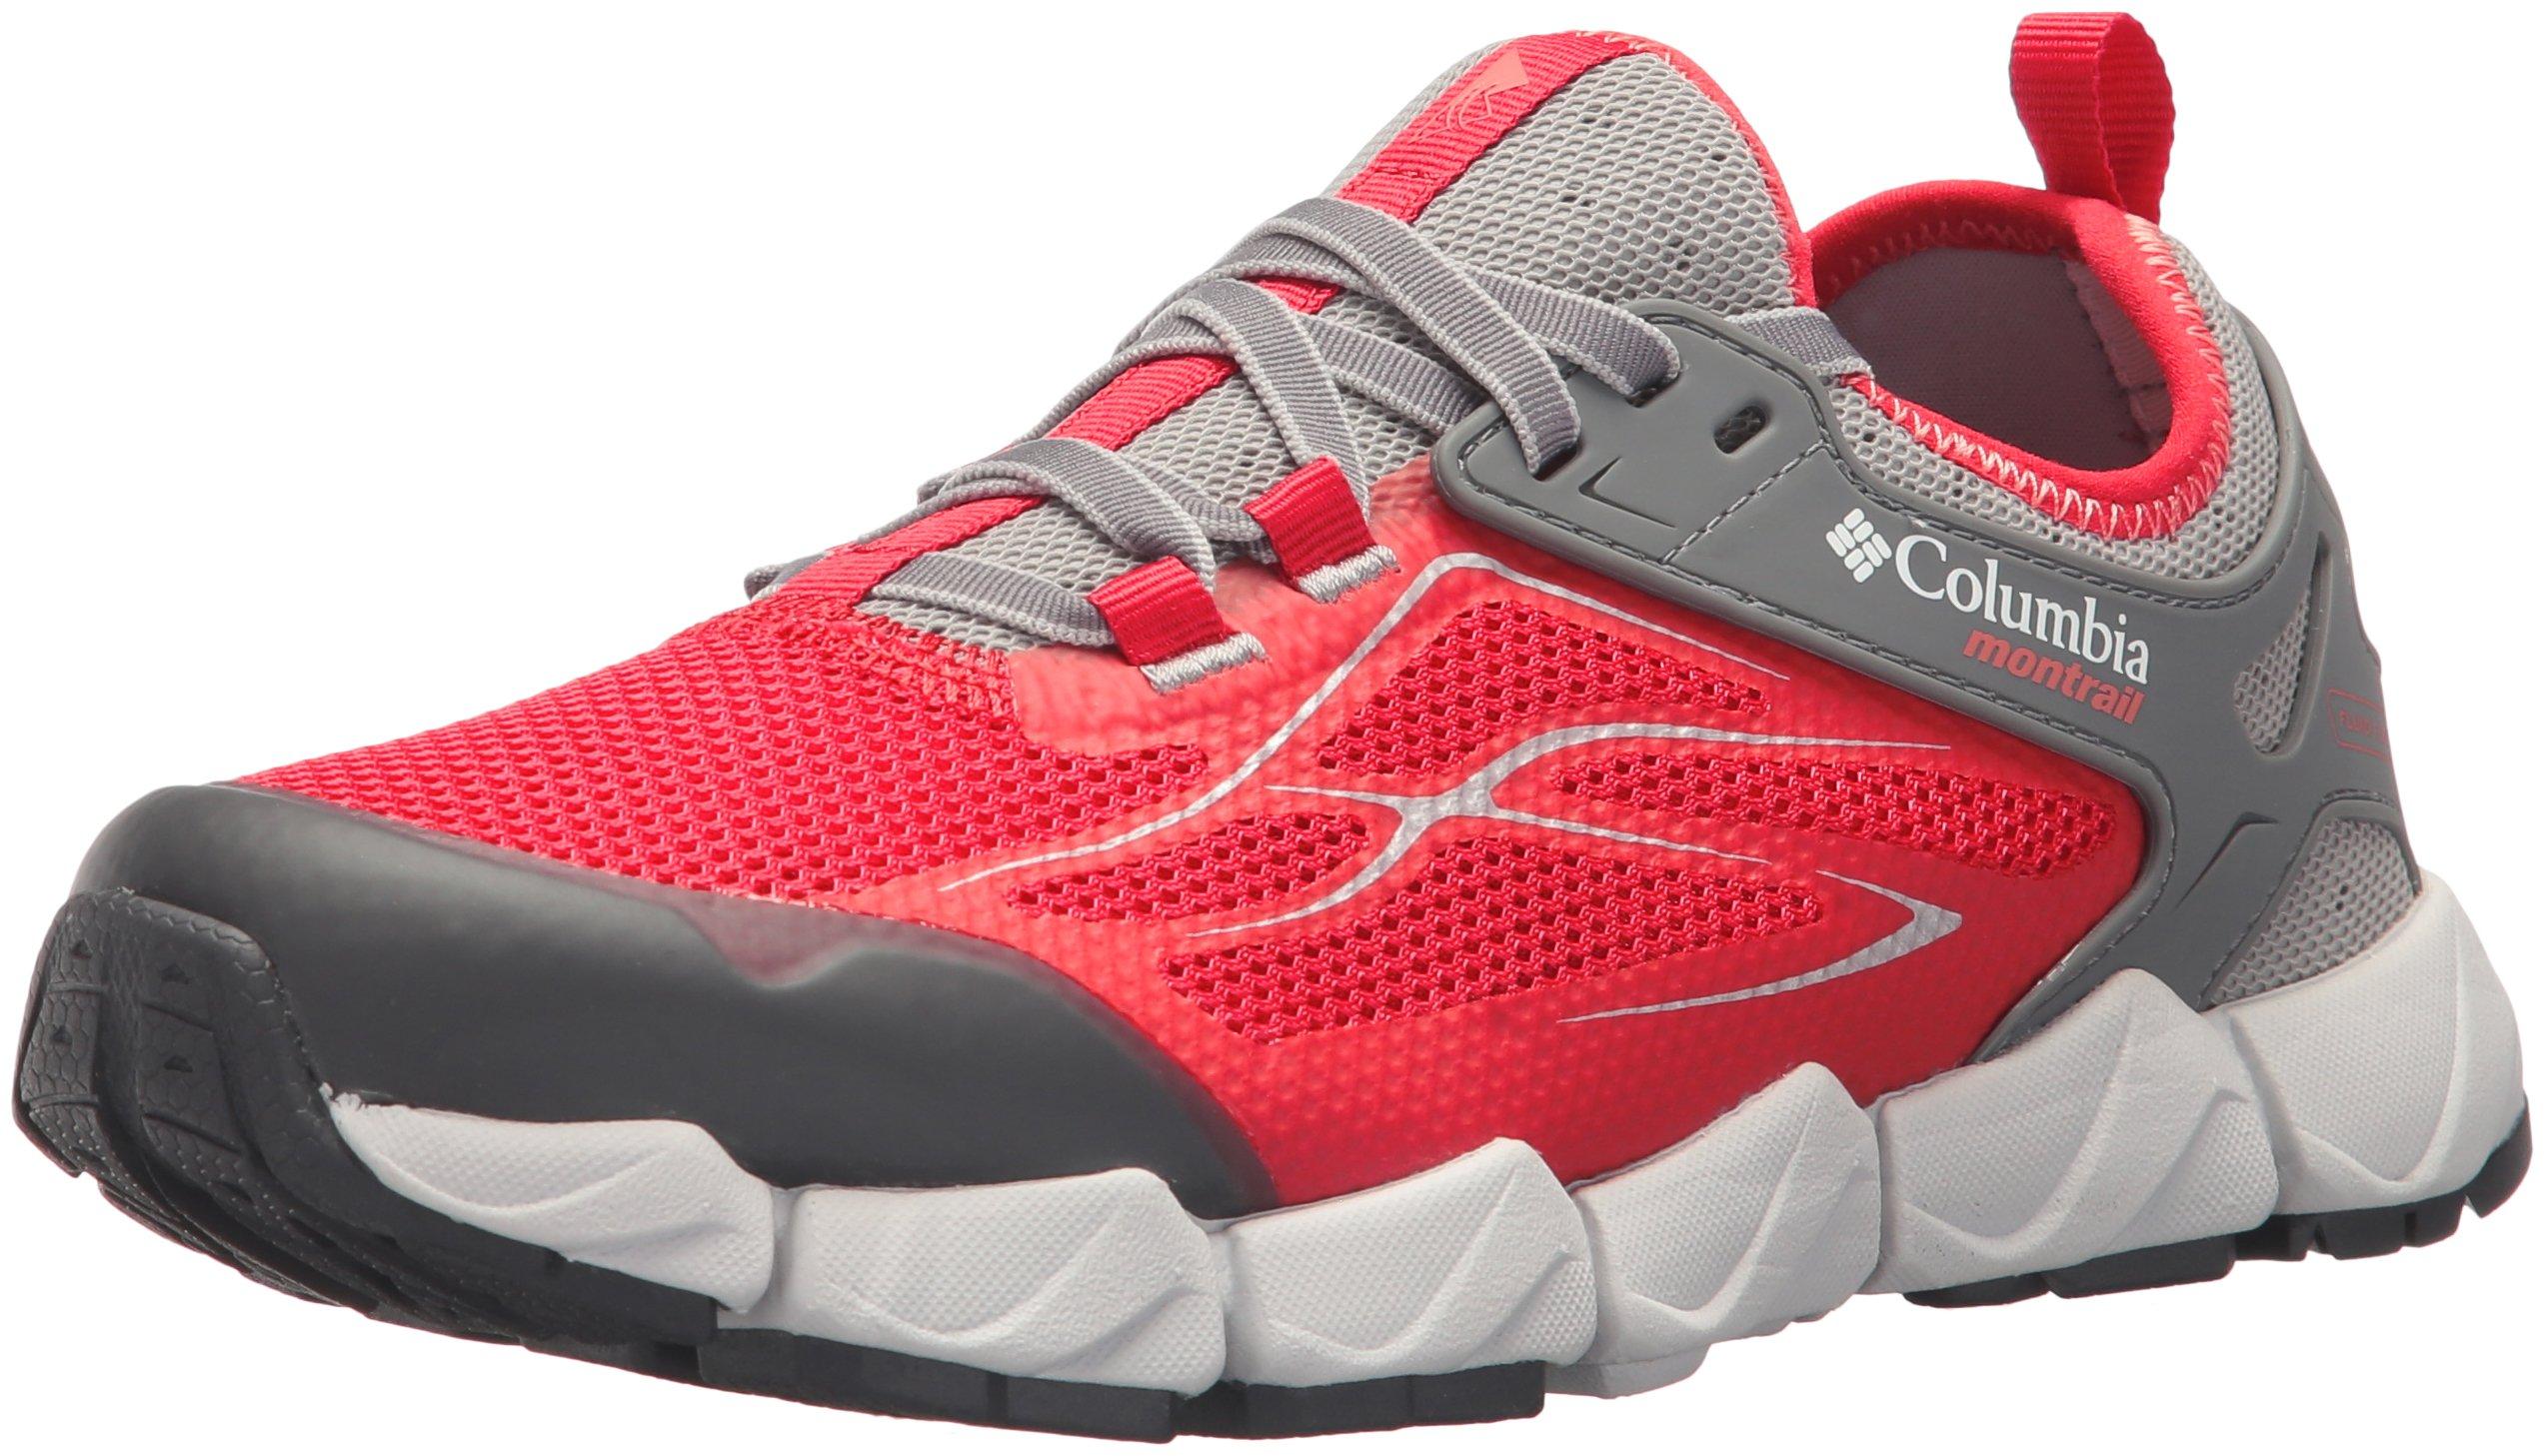 Columbia Women's Fluidflex X.S.R. Trail Running